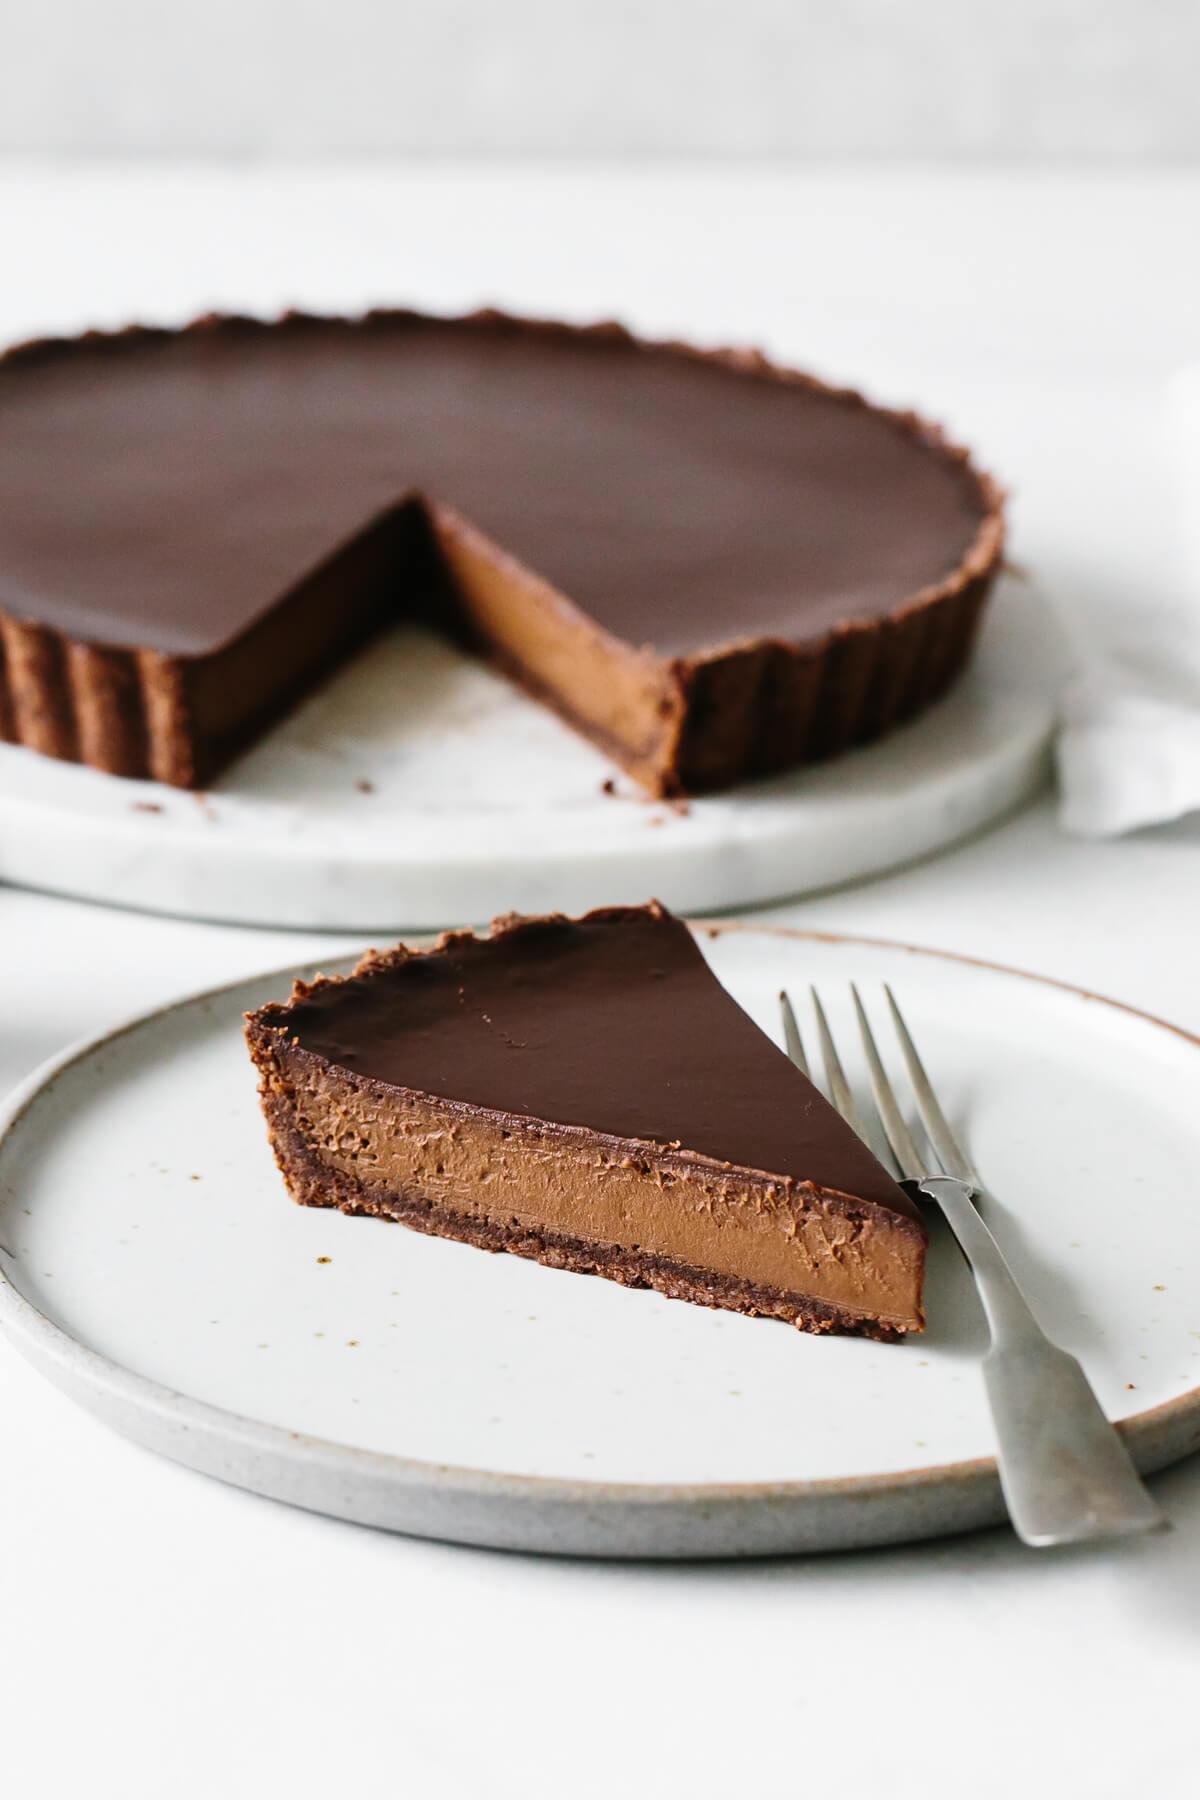 A single slice of chocolate tart on a plate.